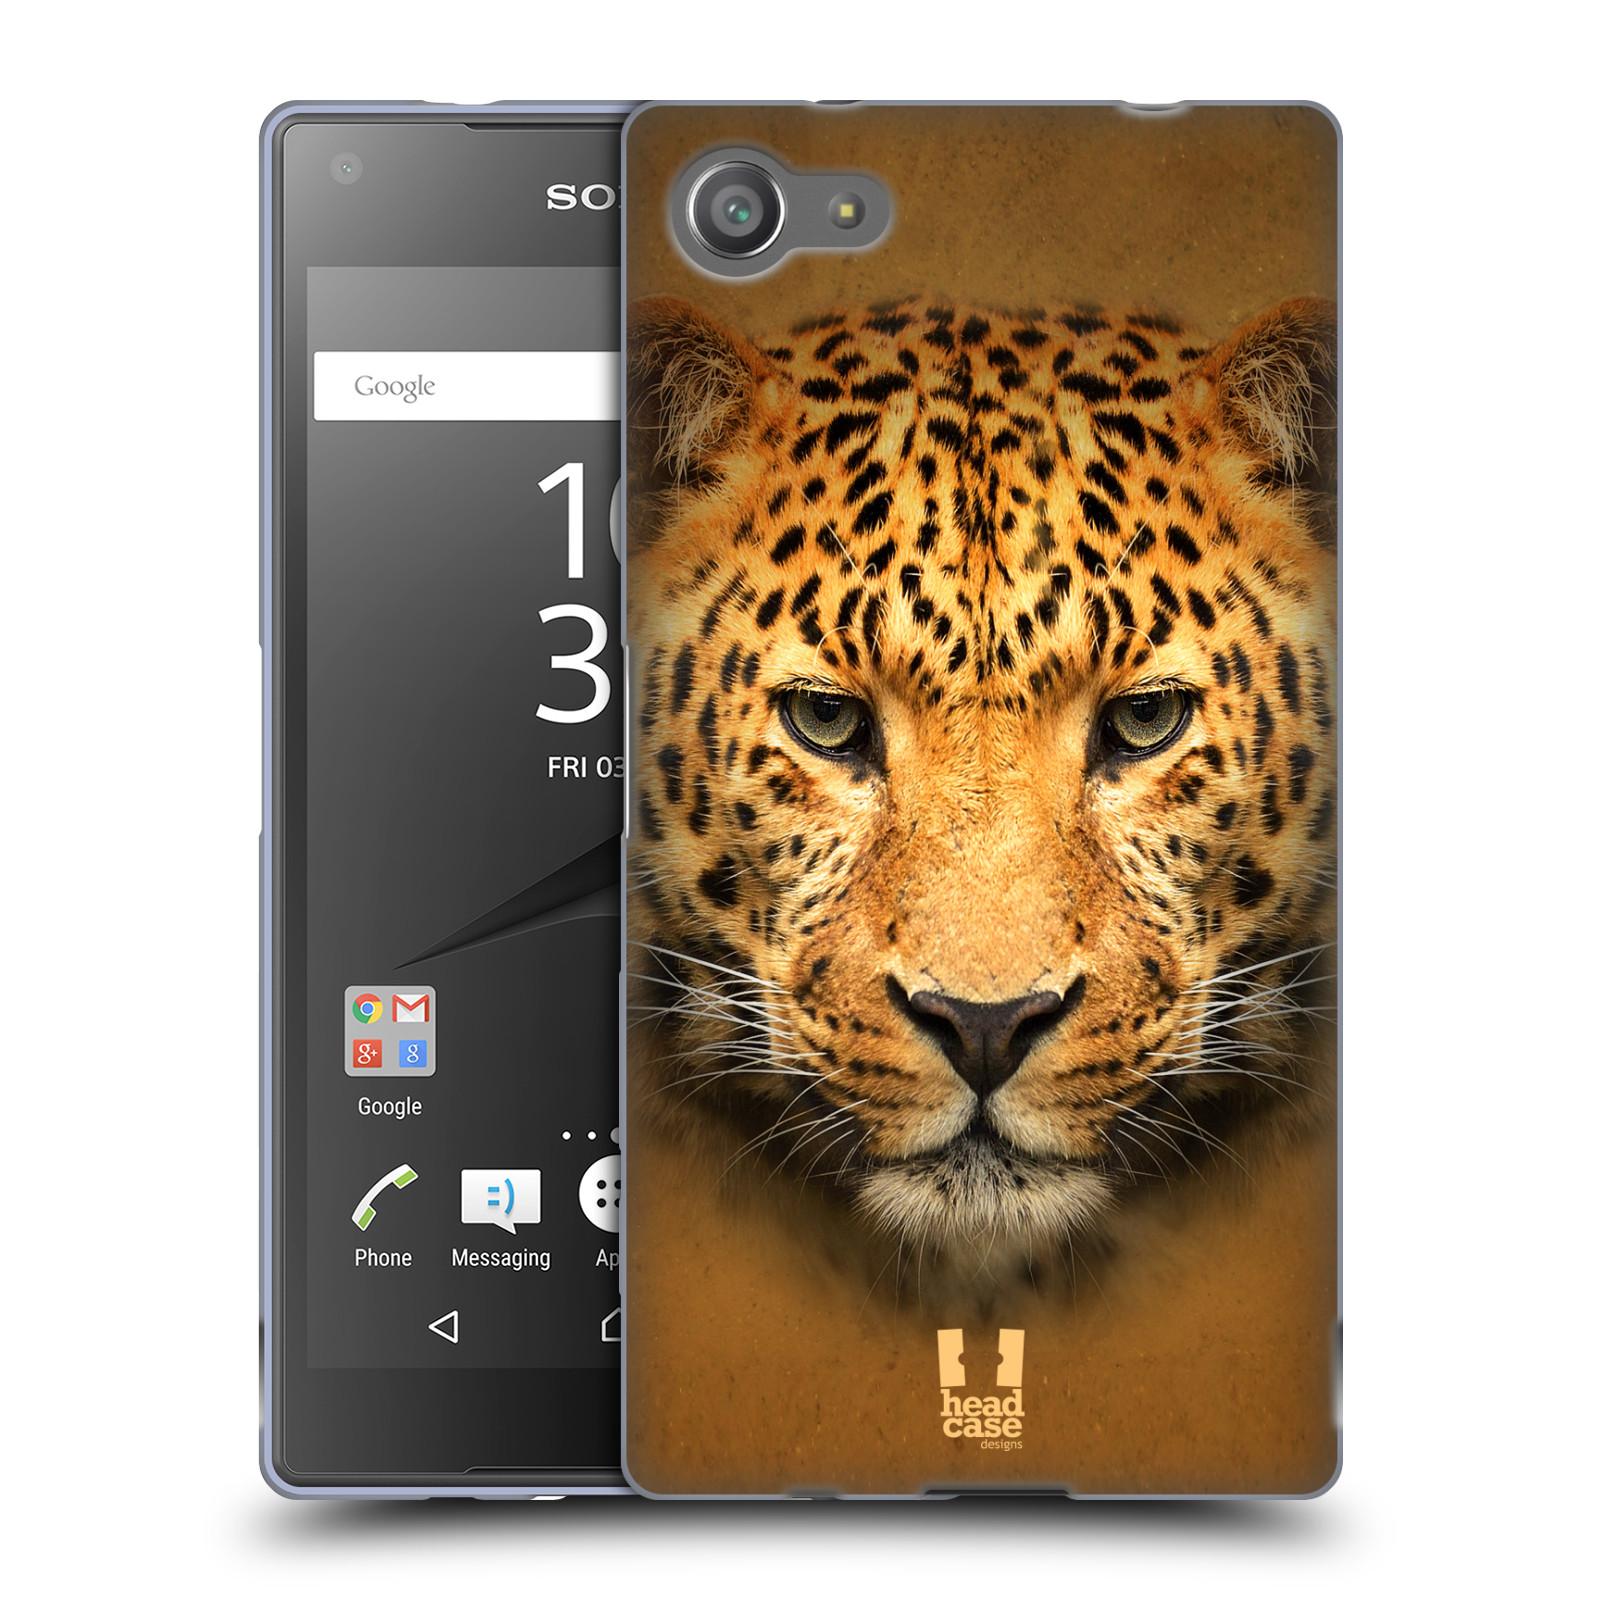 HEAD CASE silikonový obal na mobil Sony Xperia Z5 COMPACT vzor Zvířecí tváře 2 leopard